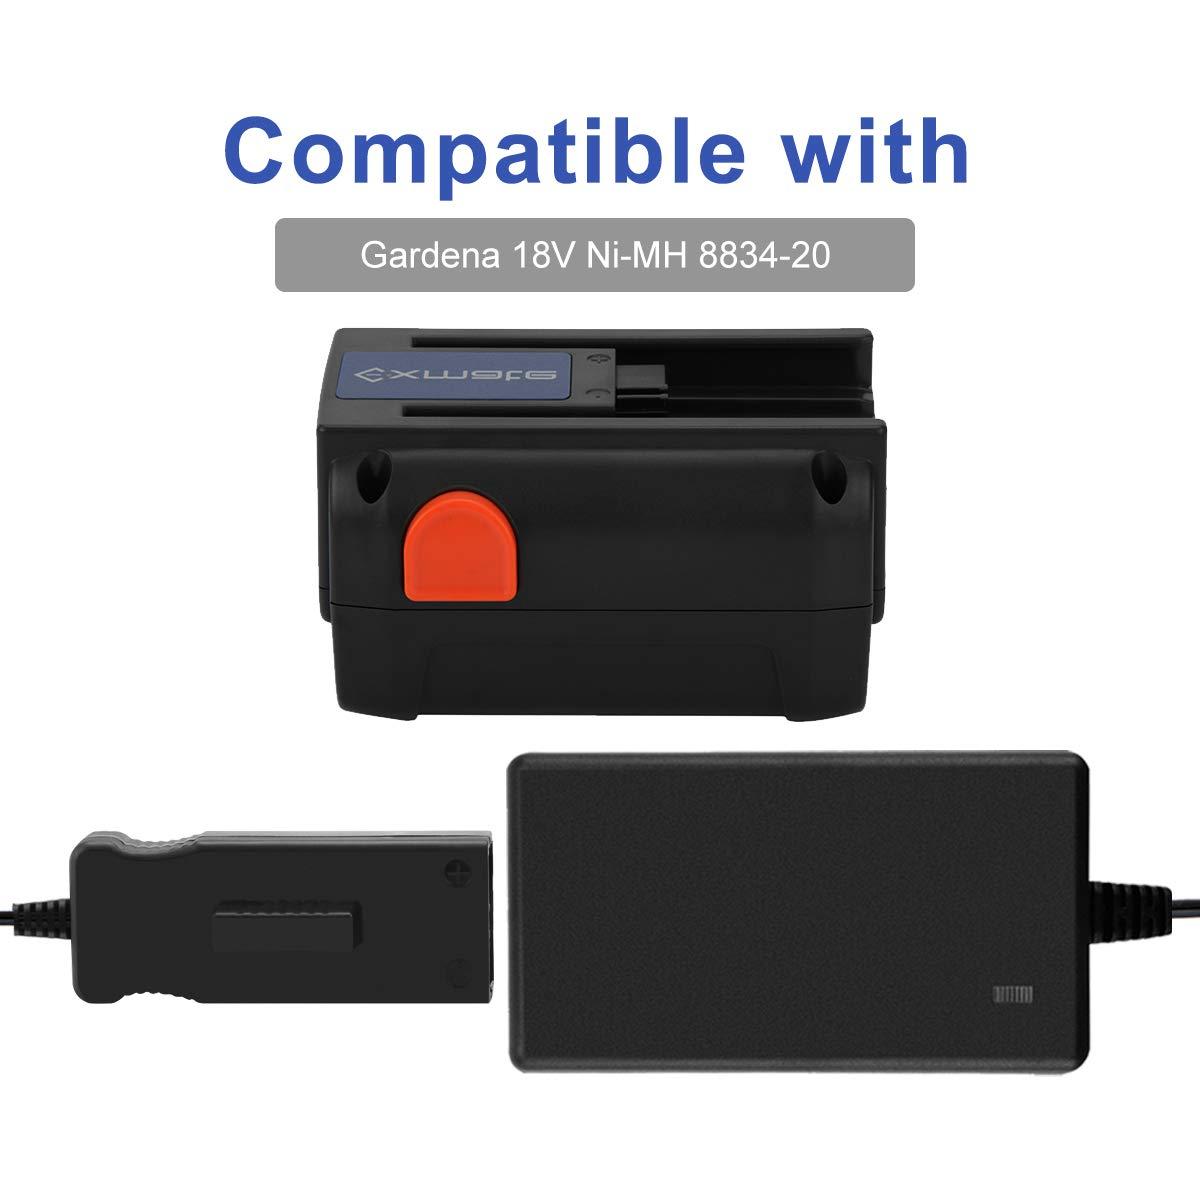 Exmate Cargador de bater/ía Compatible con bater/ías de estilo deslizable Gardena 8834-20 Ni-MH//Ni-Cd no para bater/ías de ion de litio